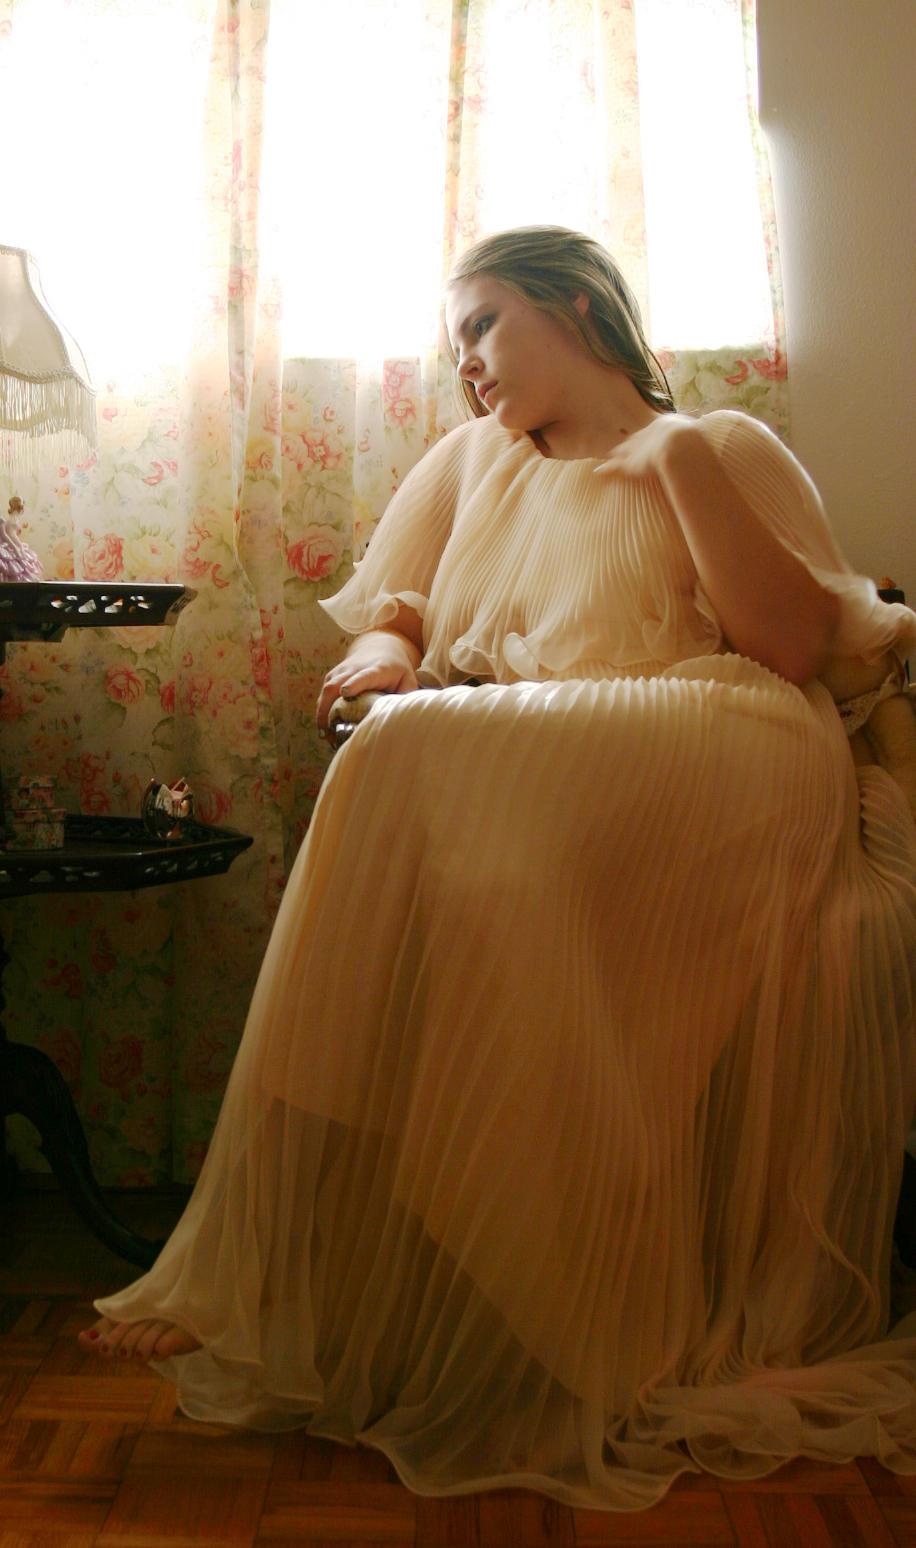 Peach Dress: Thinking by Della-Stock